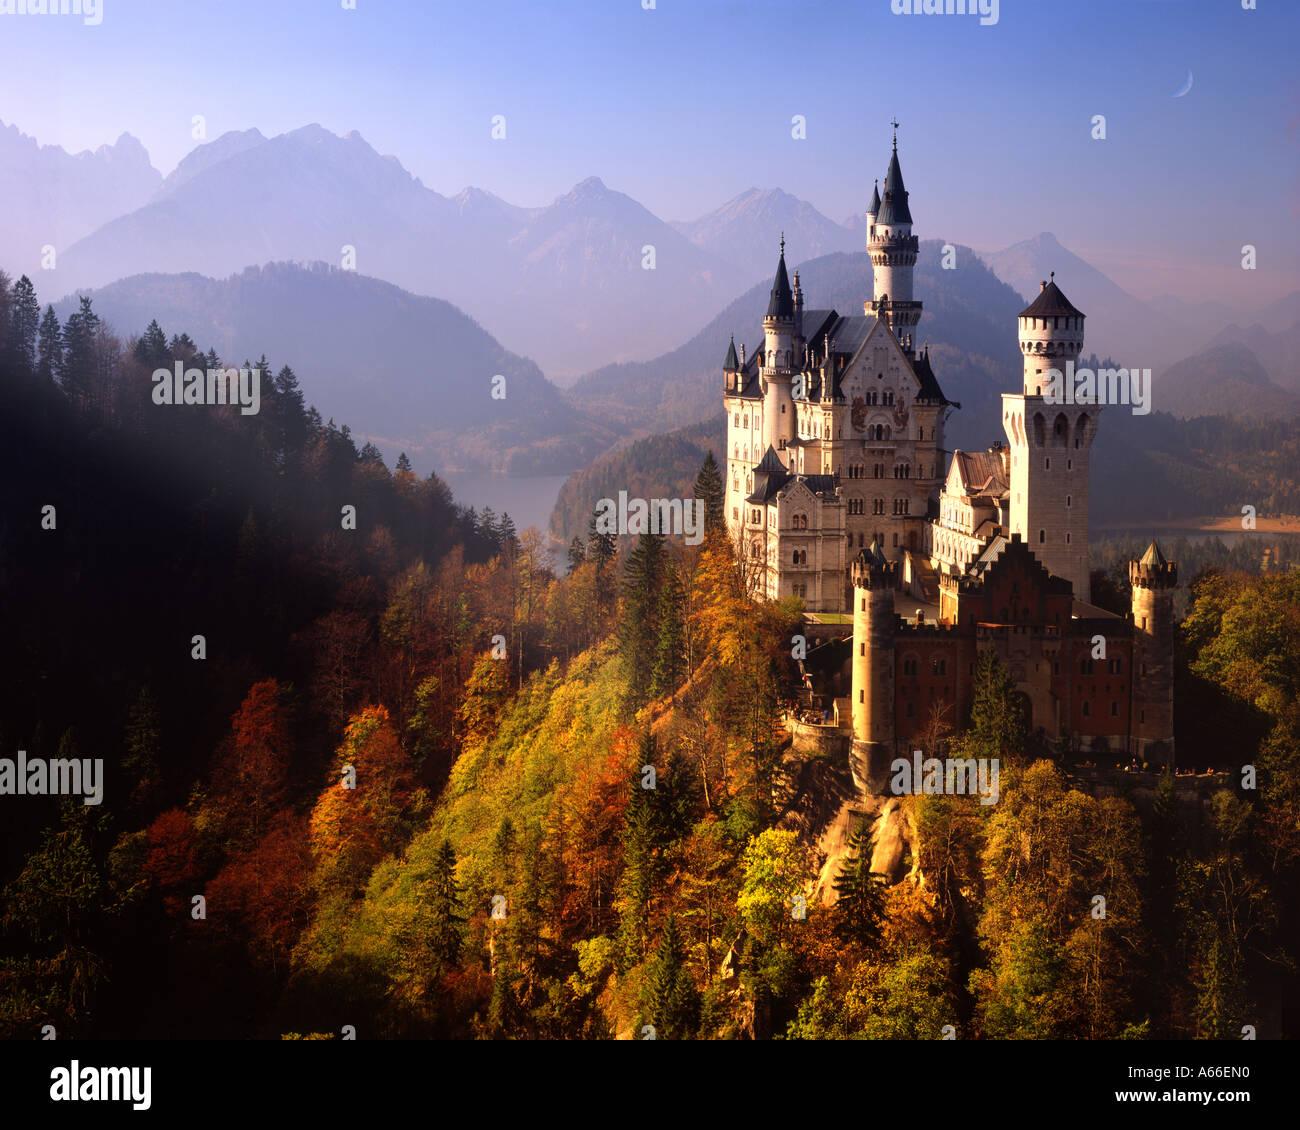 DE -  BAVARIA:  Neuschwanstein Castle - Stock Image